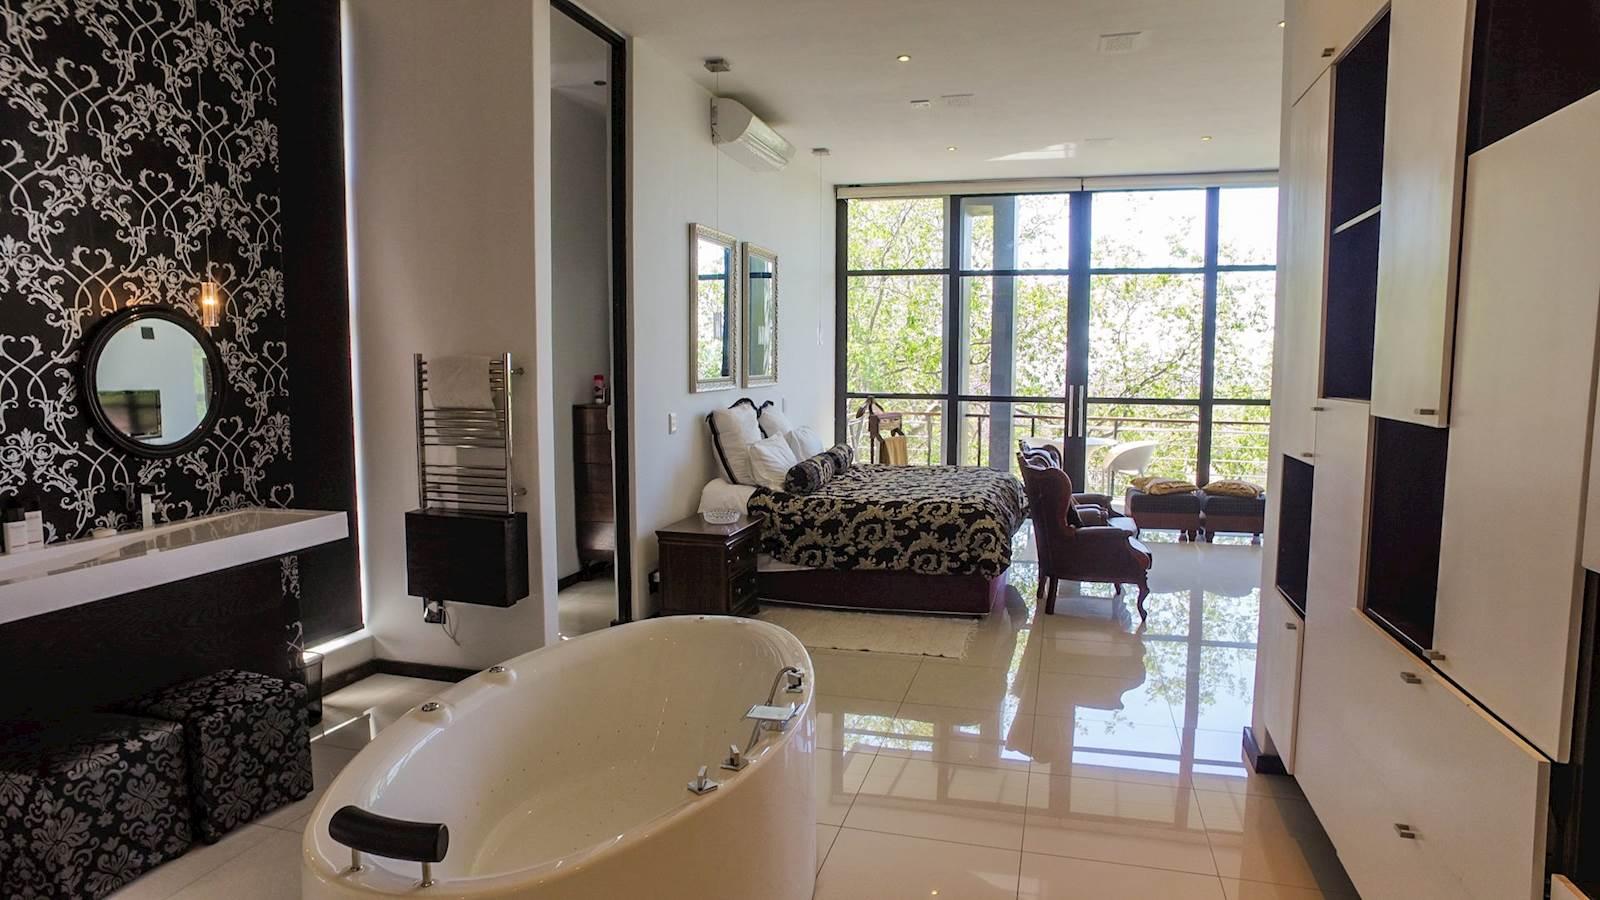 3 Bedroom House sold in Waterkloof Ridge ENT0010698 : photo#19